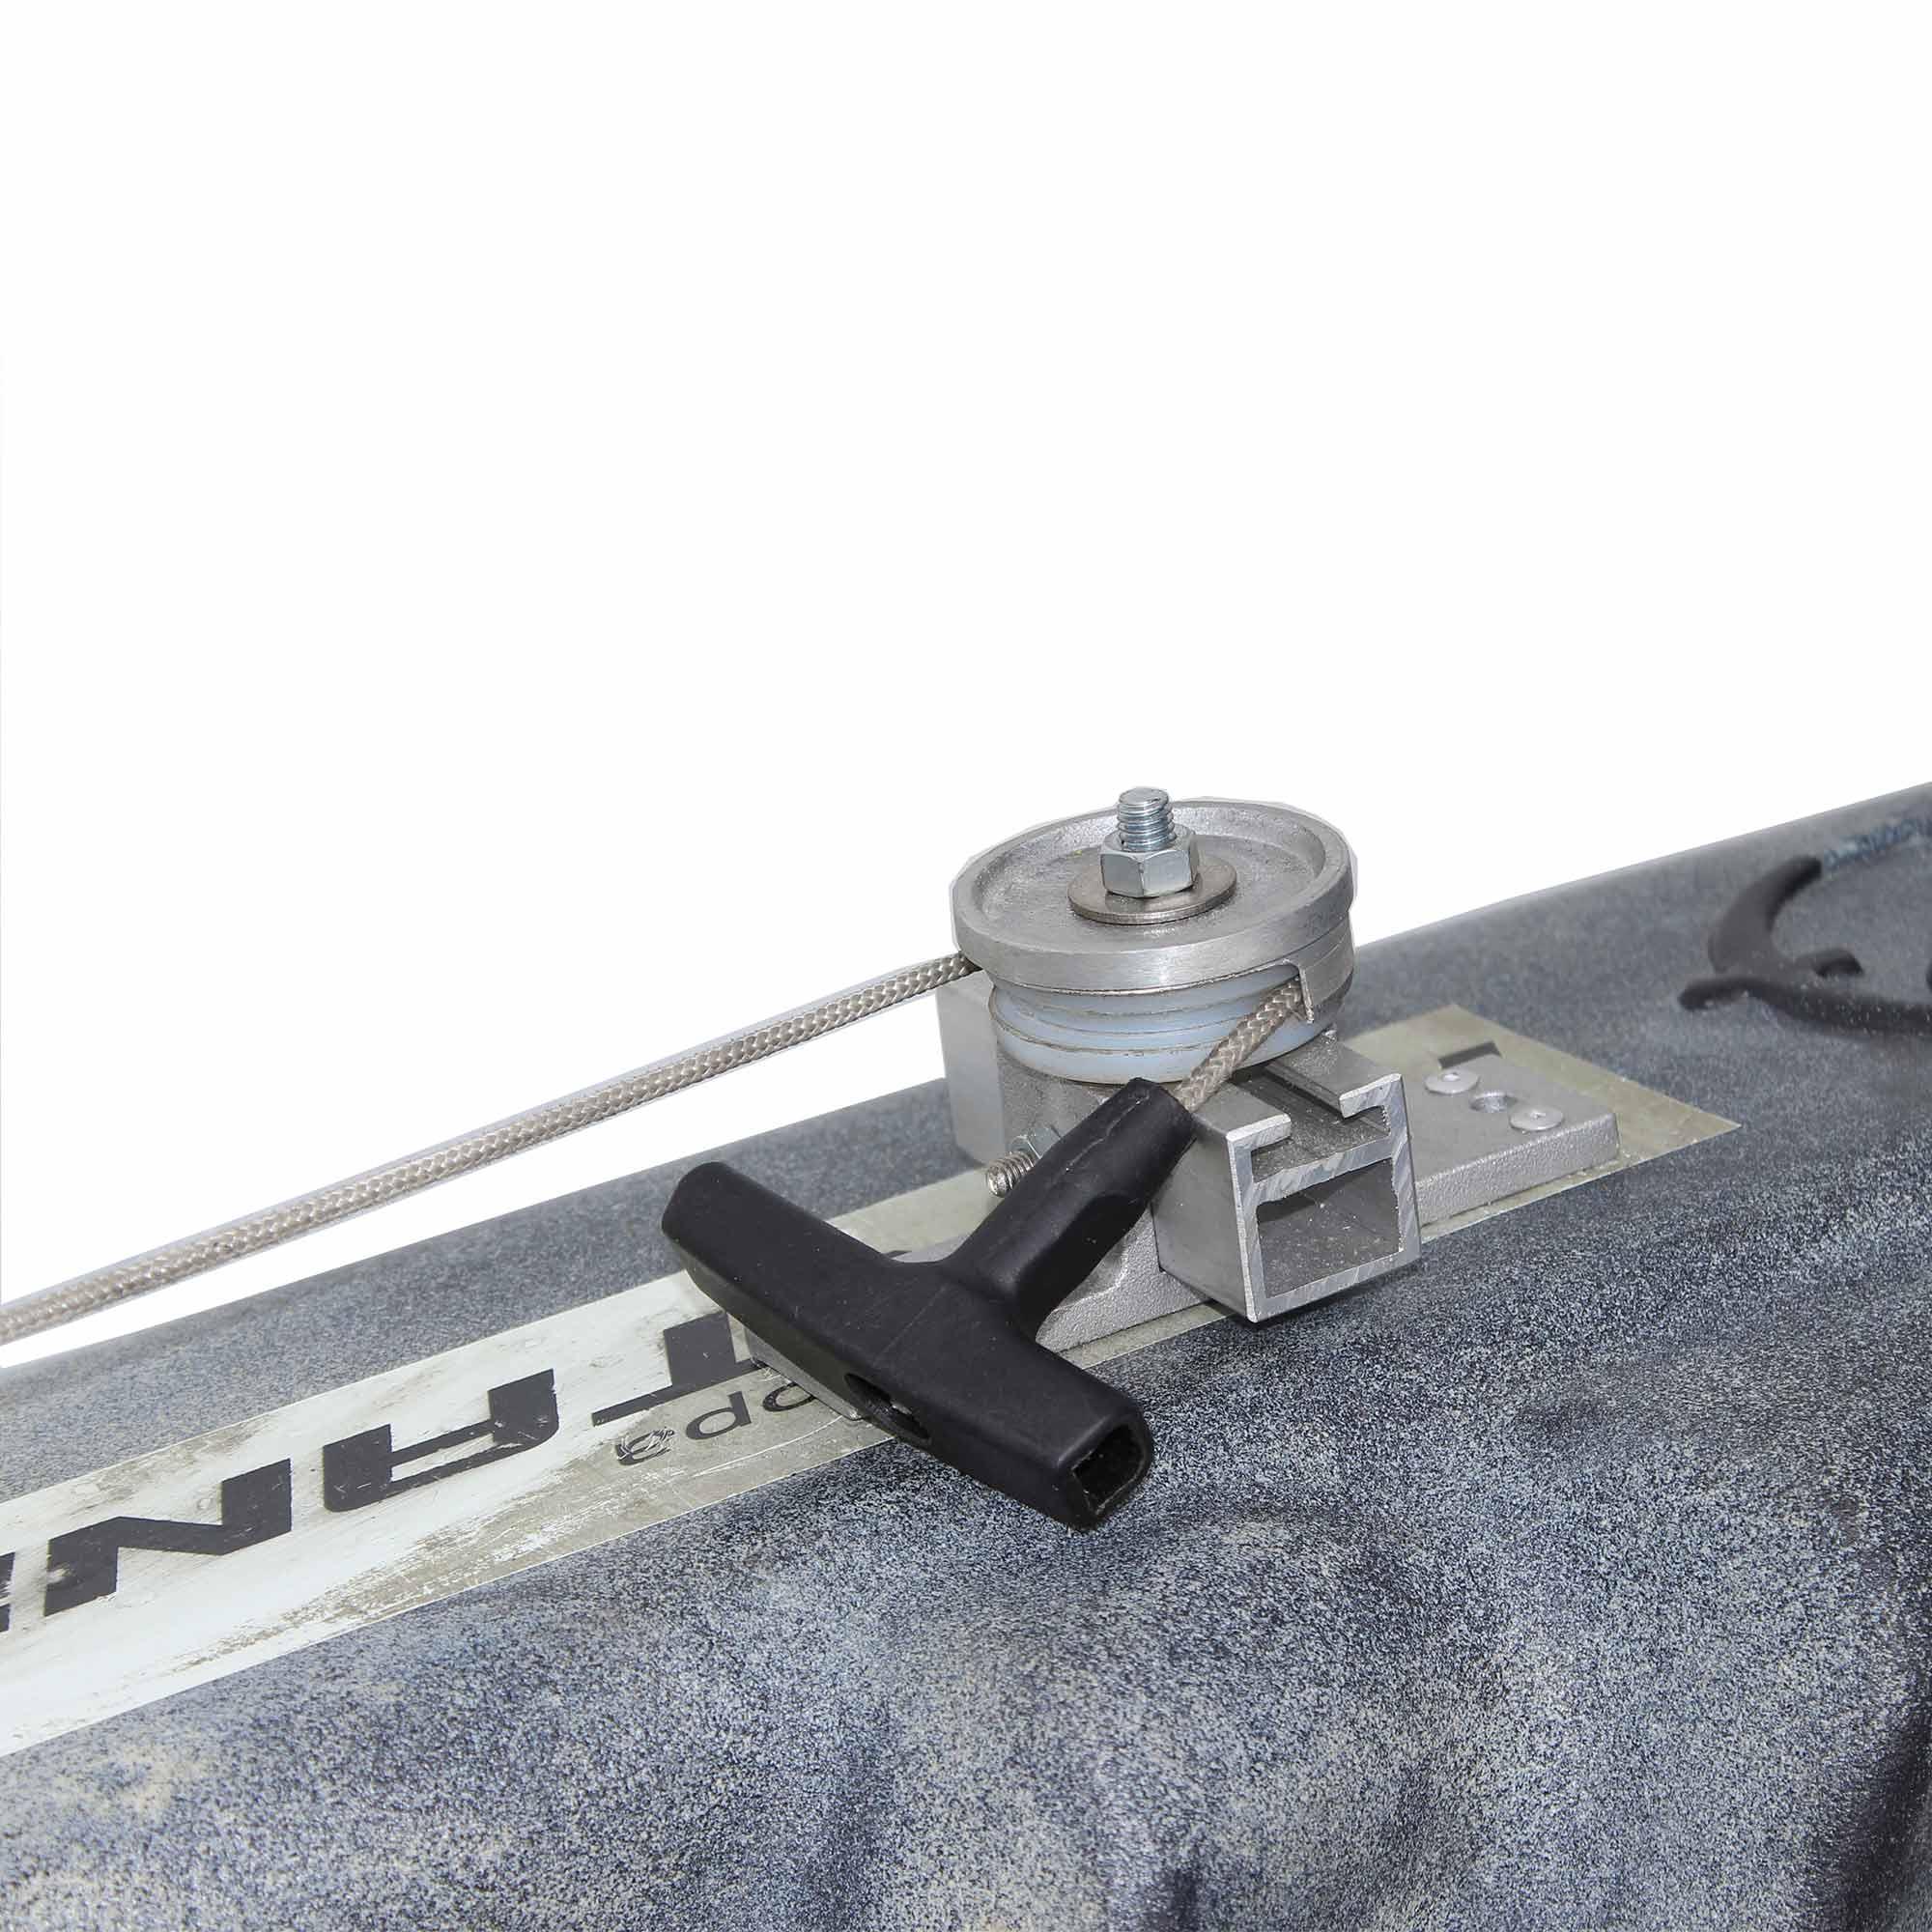 Kit Acelerador remoto Universal para caiaques